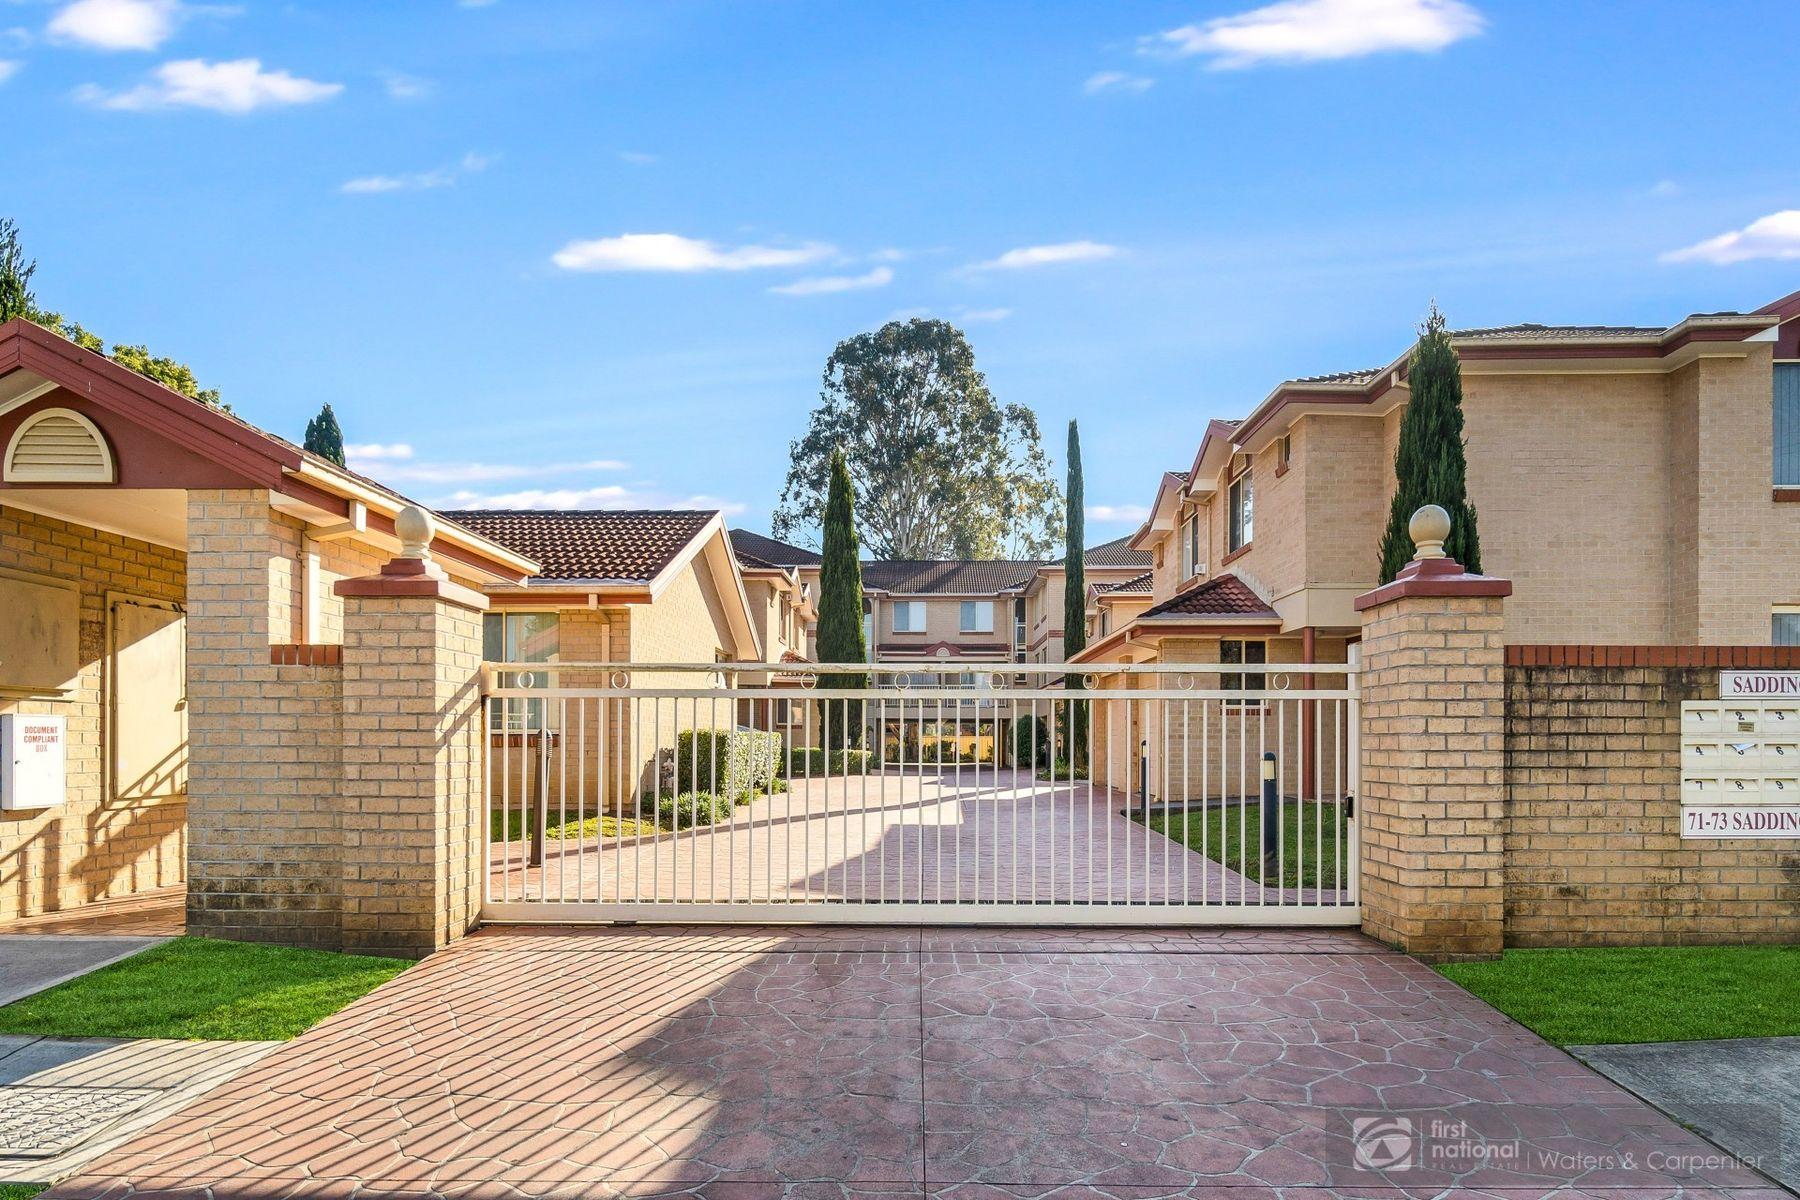 12/71-73 Saddington Street, St Marys, NSW 2760